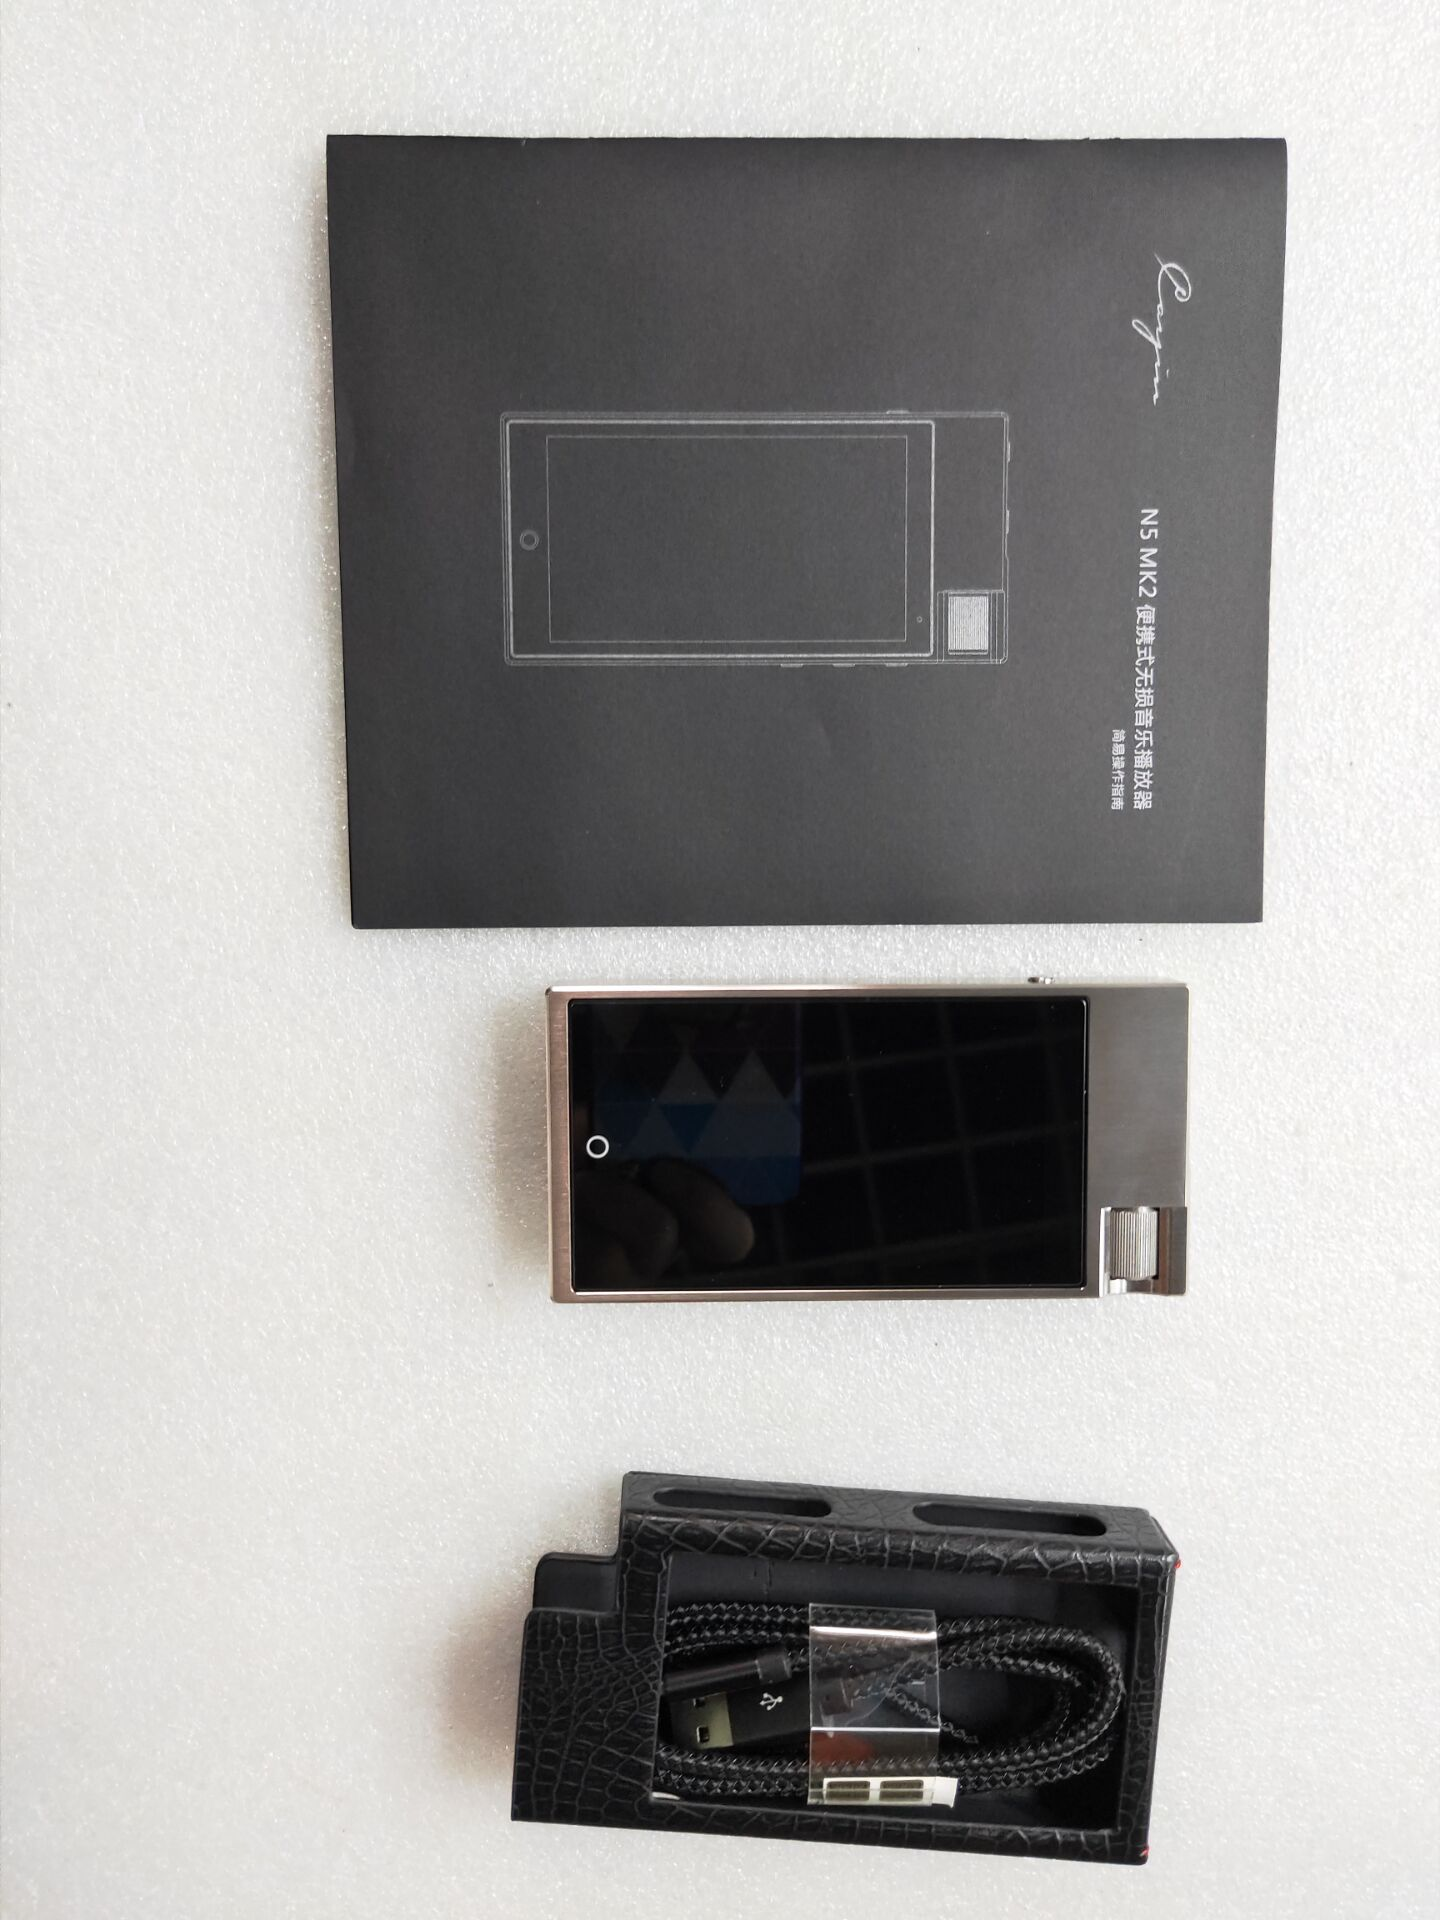 Cayin N5iiS Leathe Case Android Based Master Quality Digital Audio Player balanced lossless music HiFi player